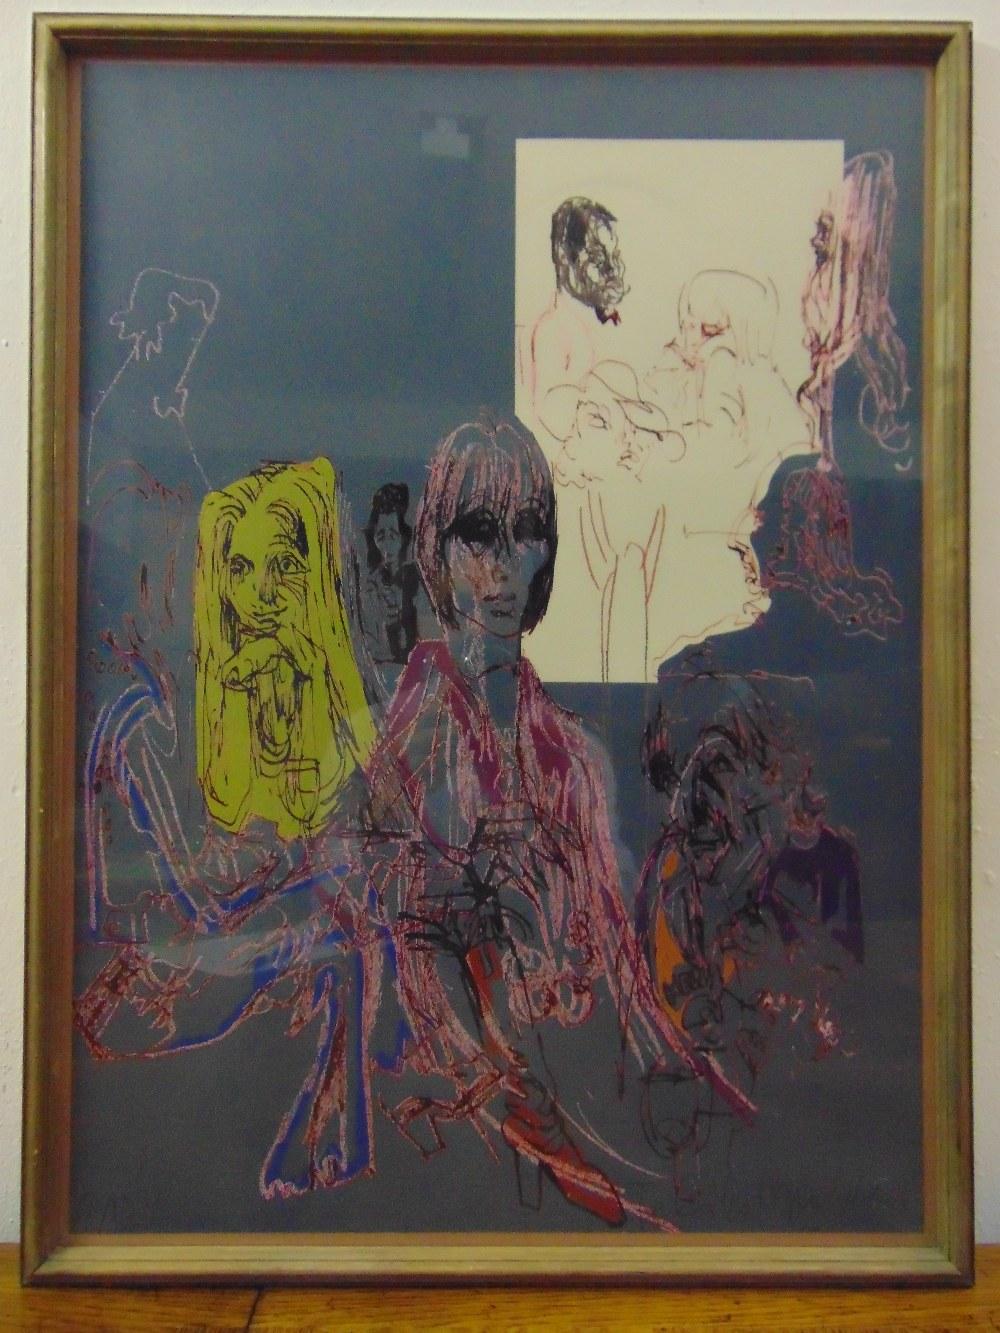 Lot 28 - Felix Topolski framed and glazed polychromatic lithographic print of figures, 80/150 signed bottom